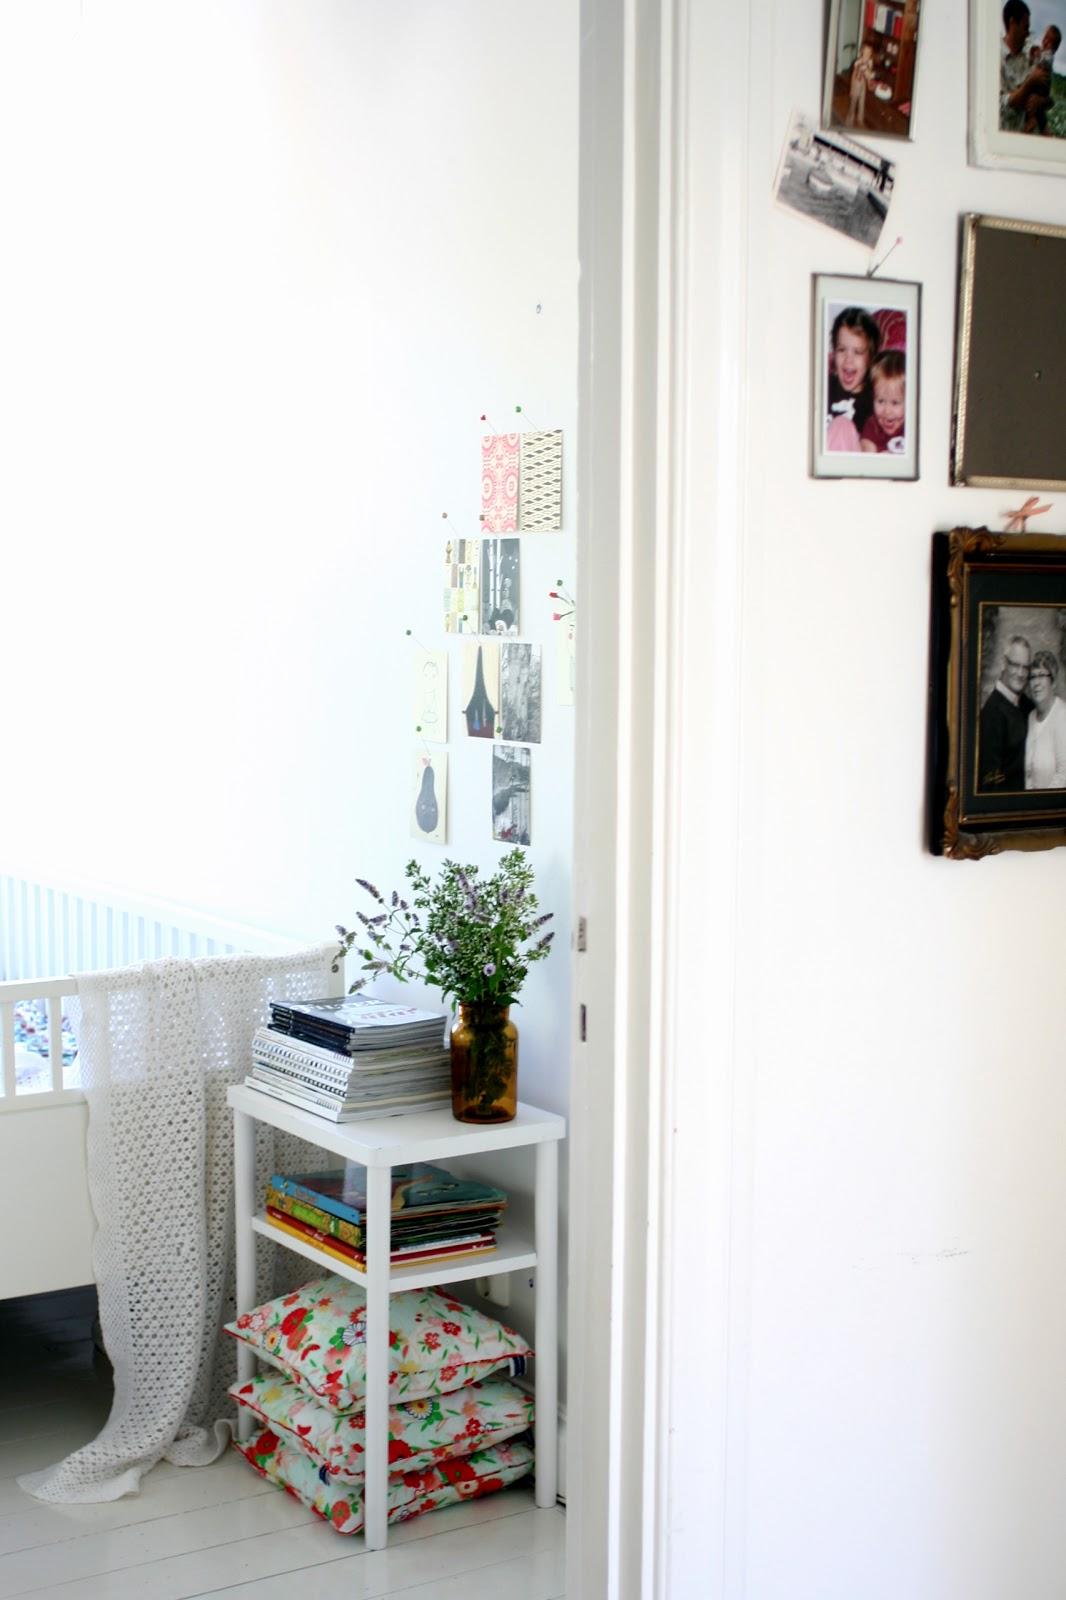 Mokkasin Blog Freelancer In Photography Diy Marketing And Ikea Fixa Bor Template Oranye Jag Har Ju S Fullt Upp